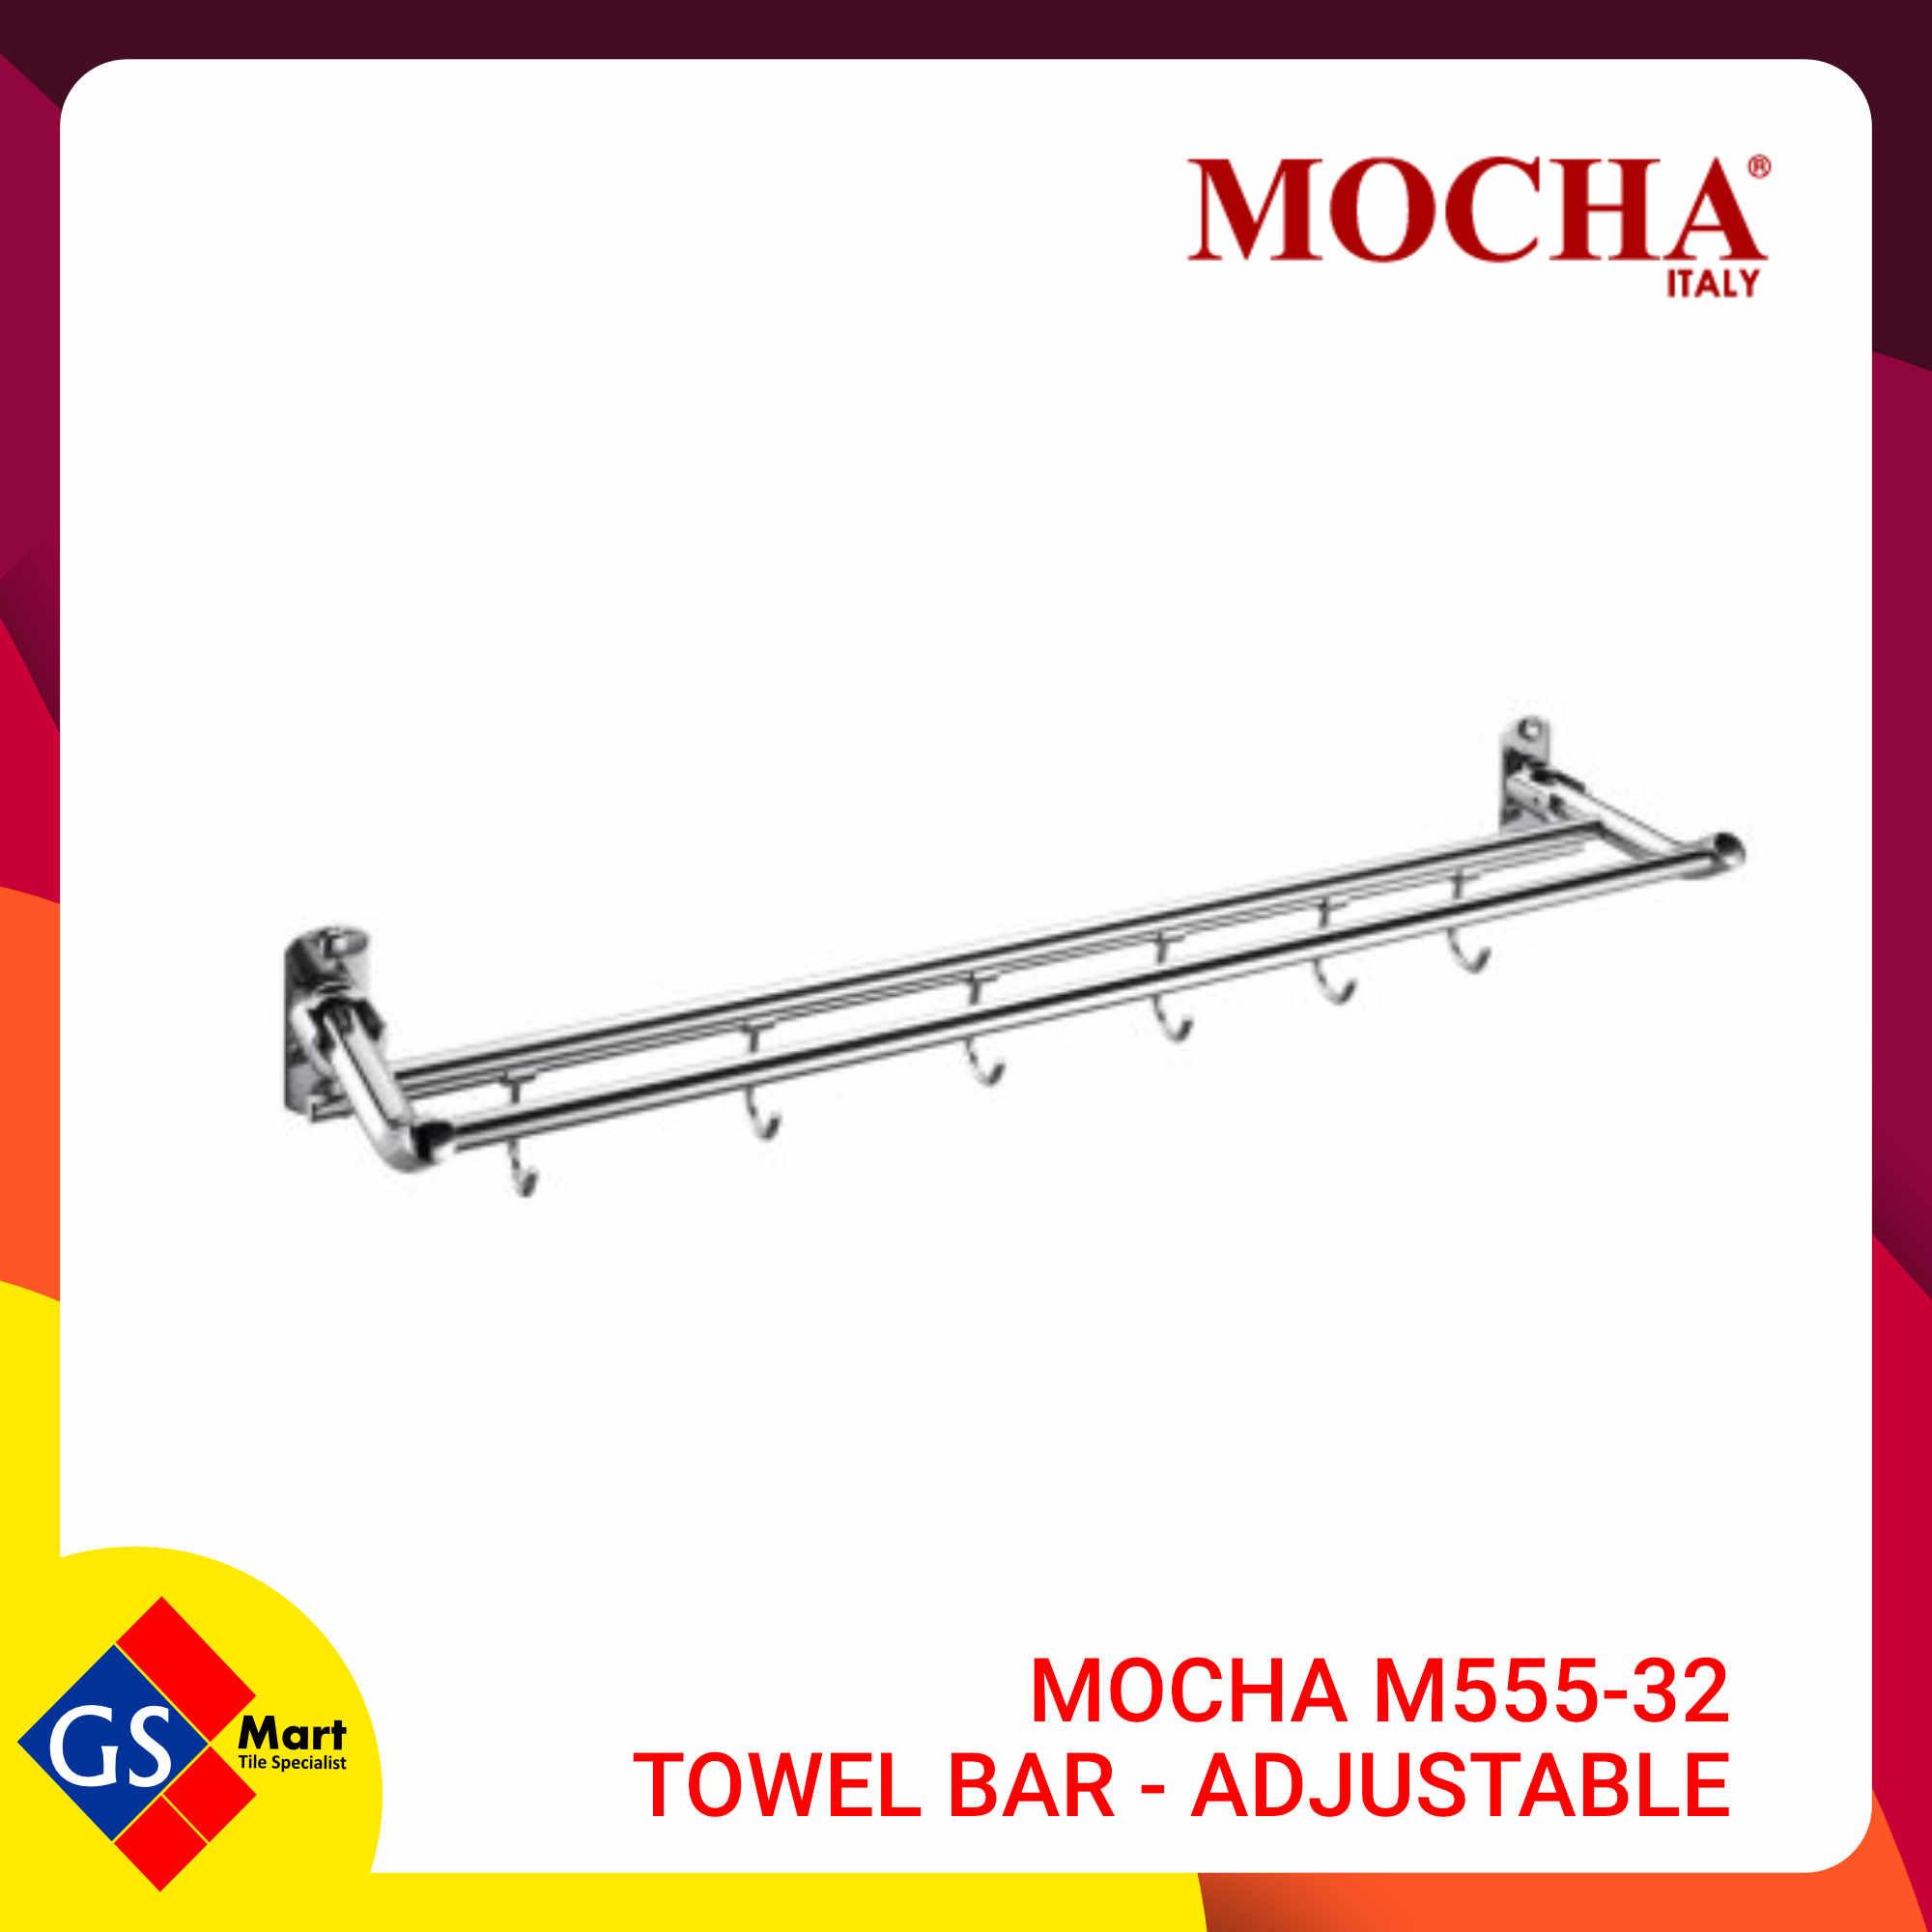 MOCHA M555-32 TOWEL BAR - Adjustable